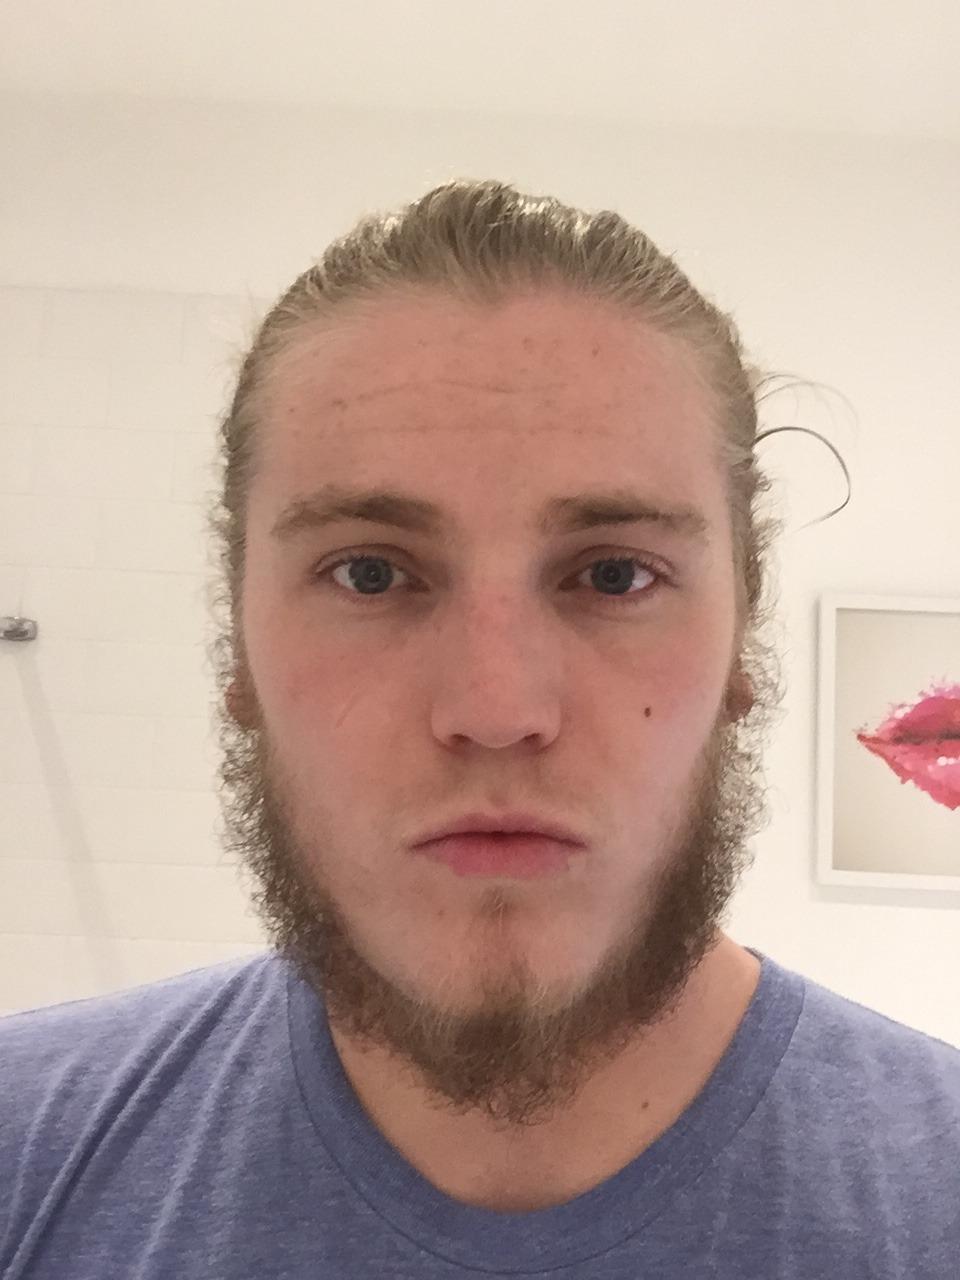 19 year old looking for some good beard ADVICE - Beard Board